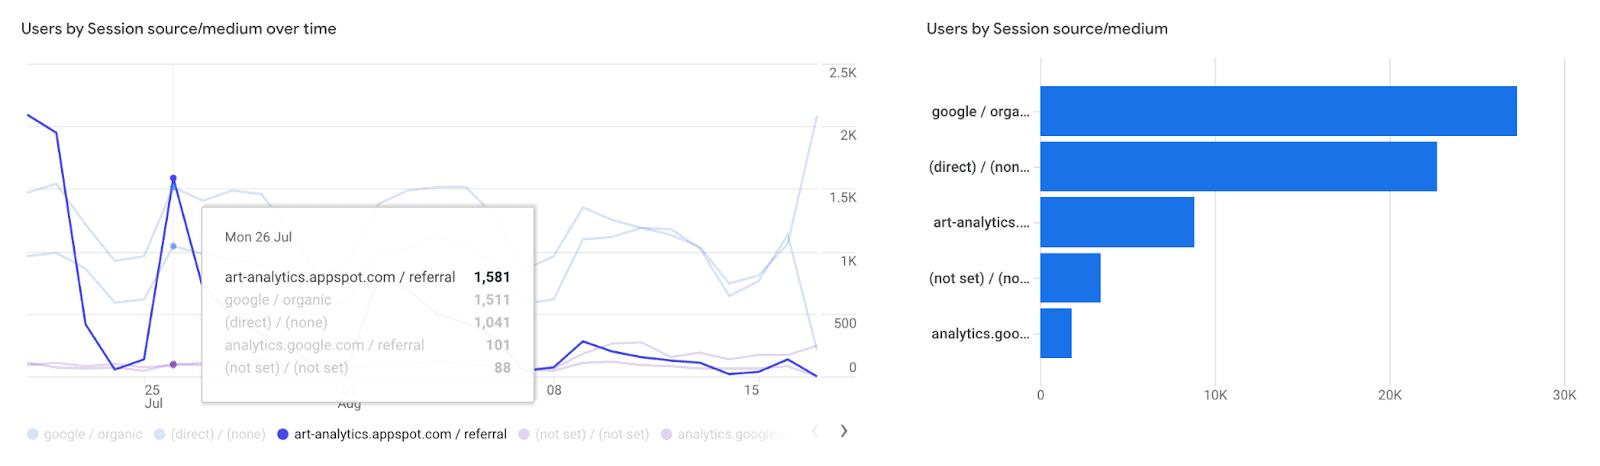 Blog traffic sources